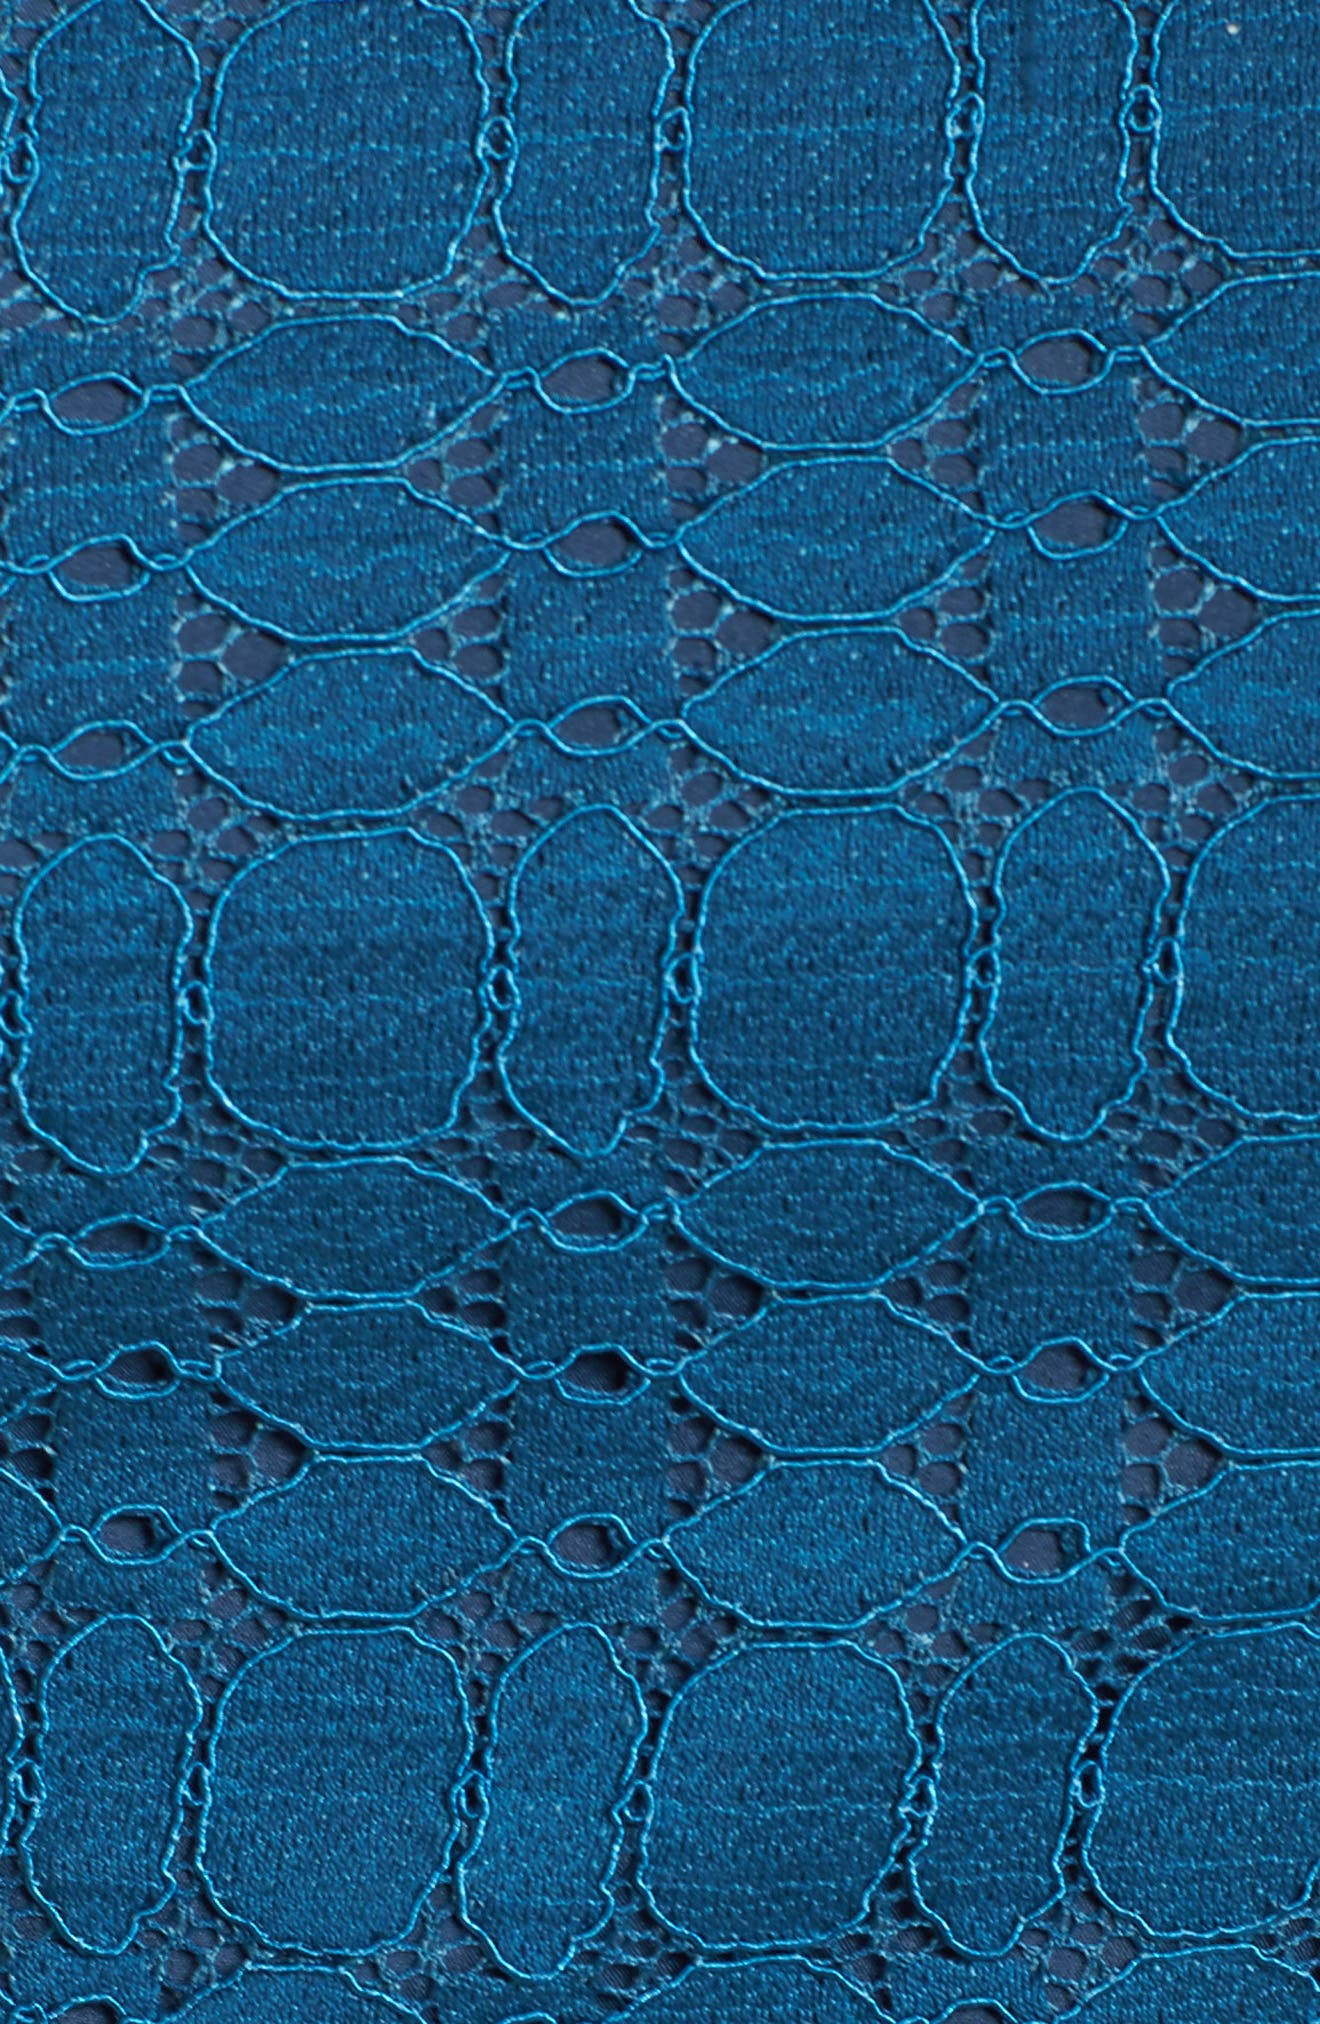 Ruffle Lace Sheath Dress,                             Alternate thumbnail 5, color,                             458